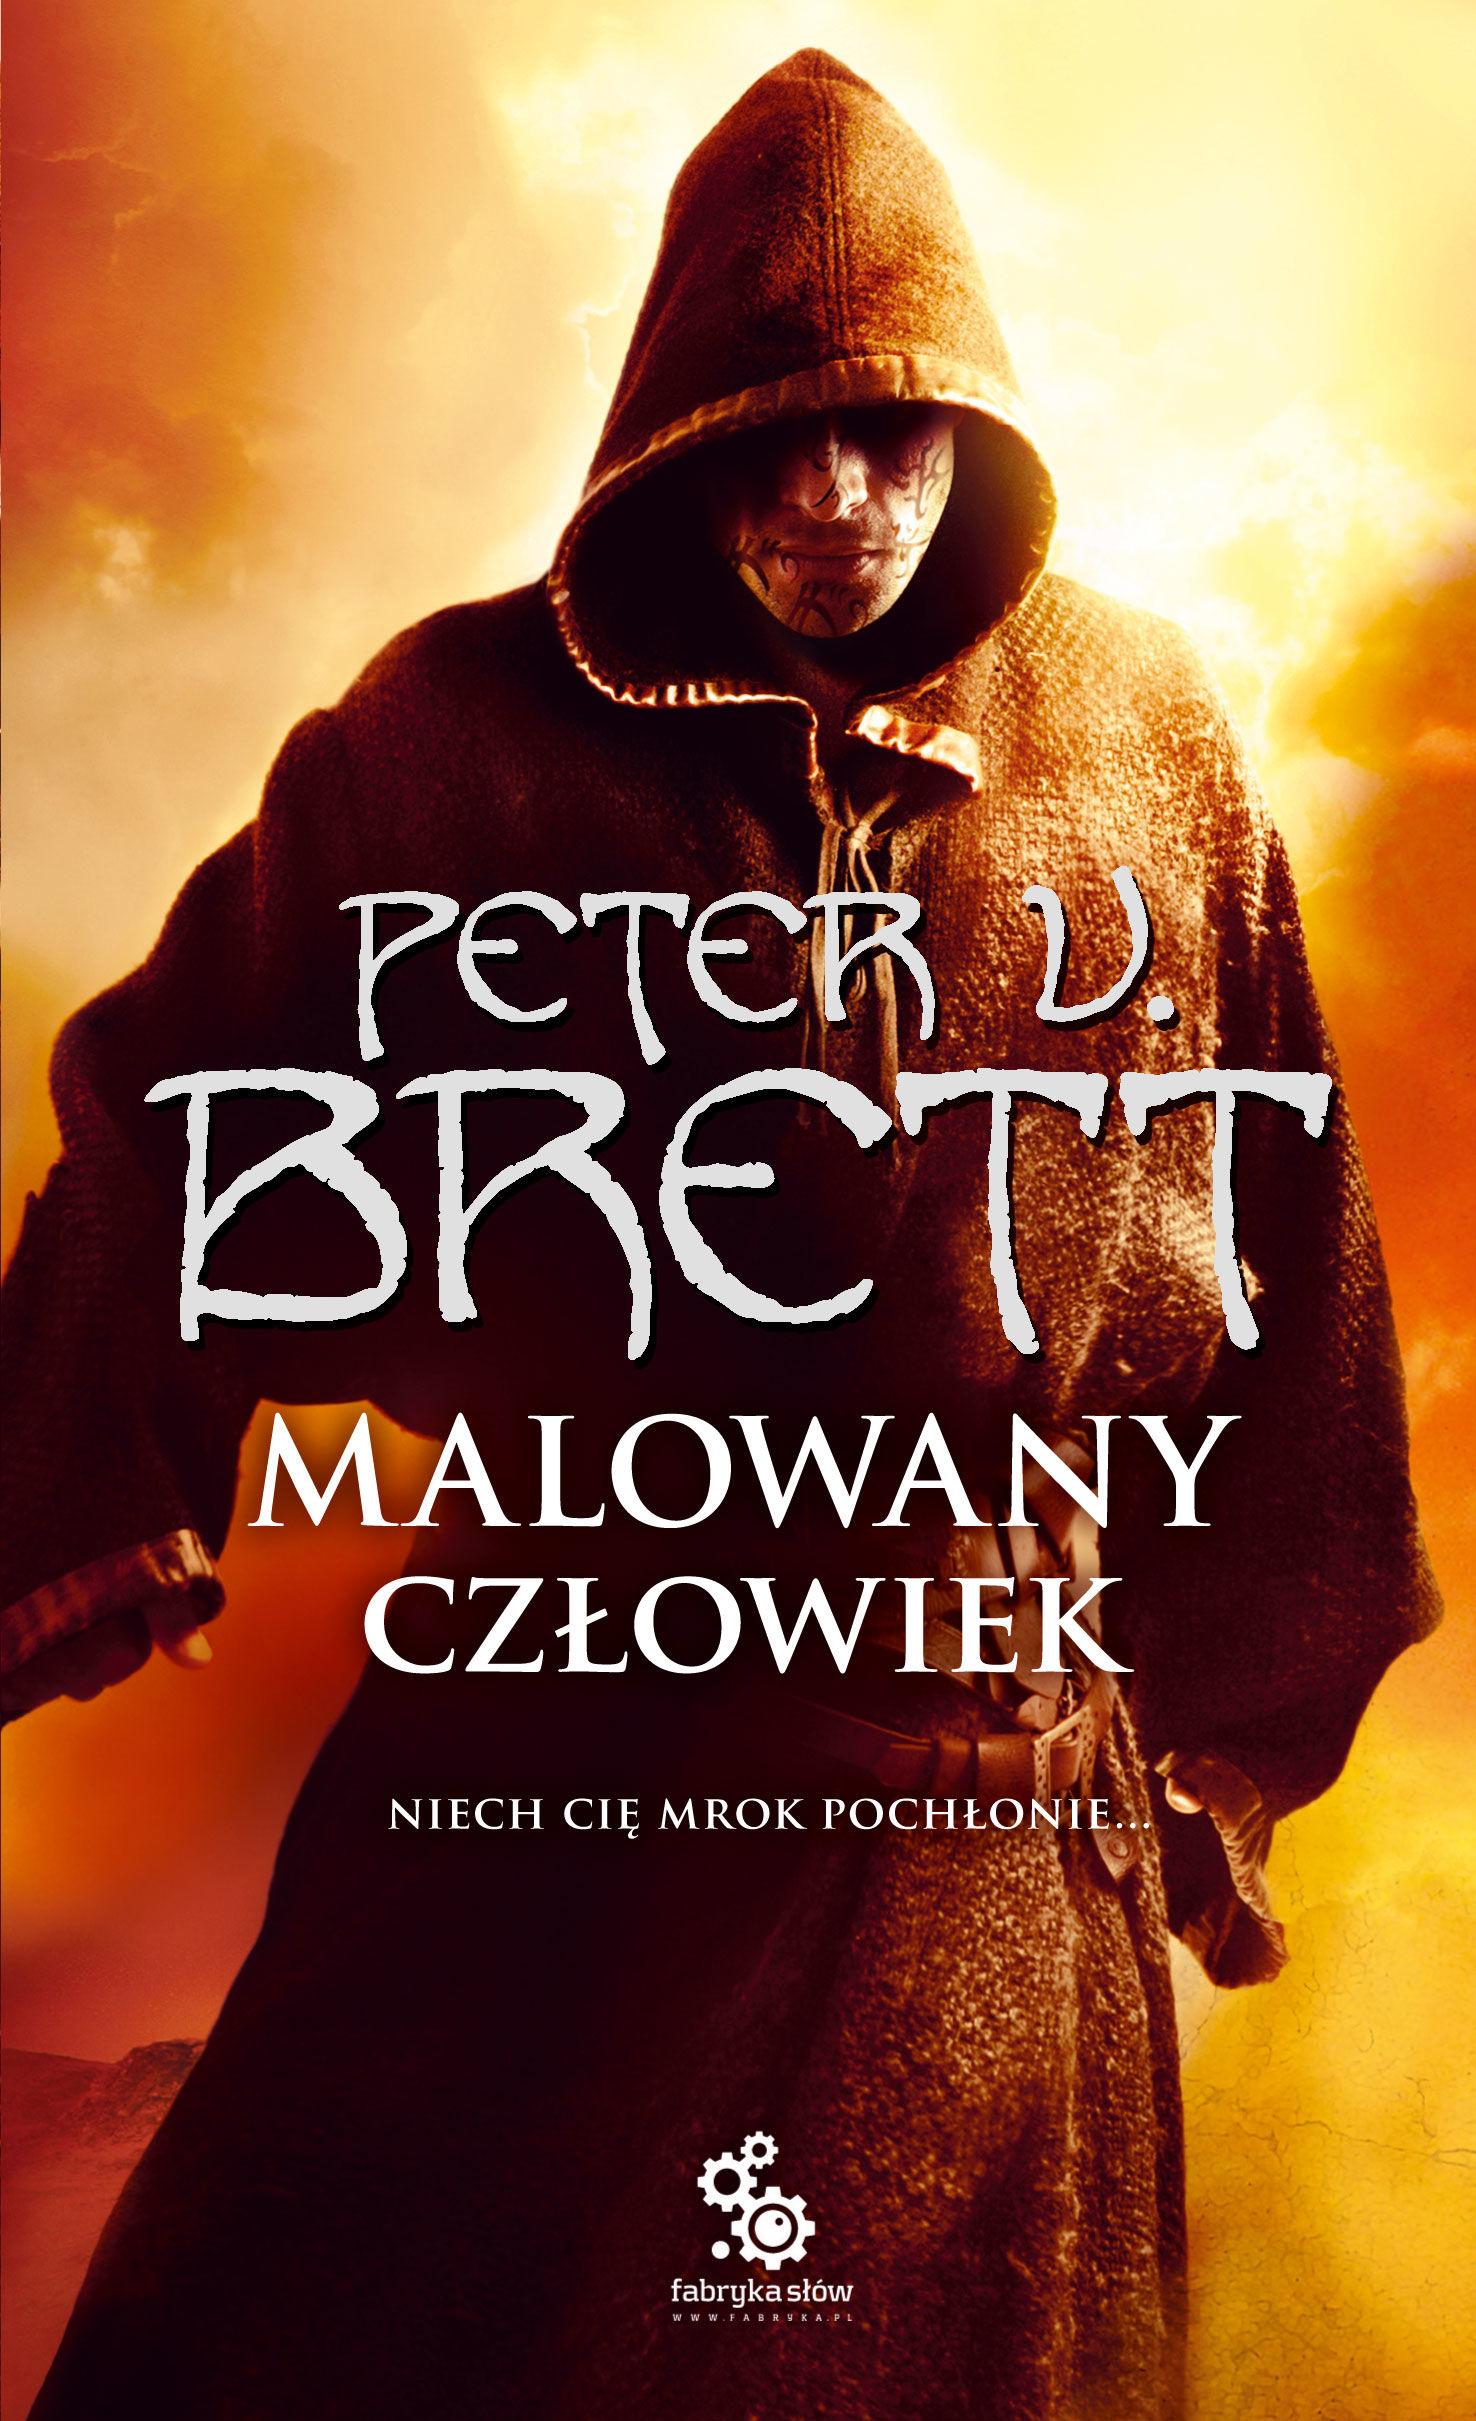 Malowany człowiek. Księga 1 - Peter V. Brett - audiobook